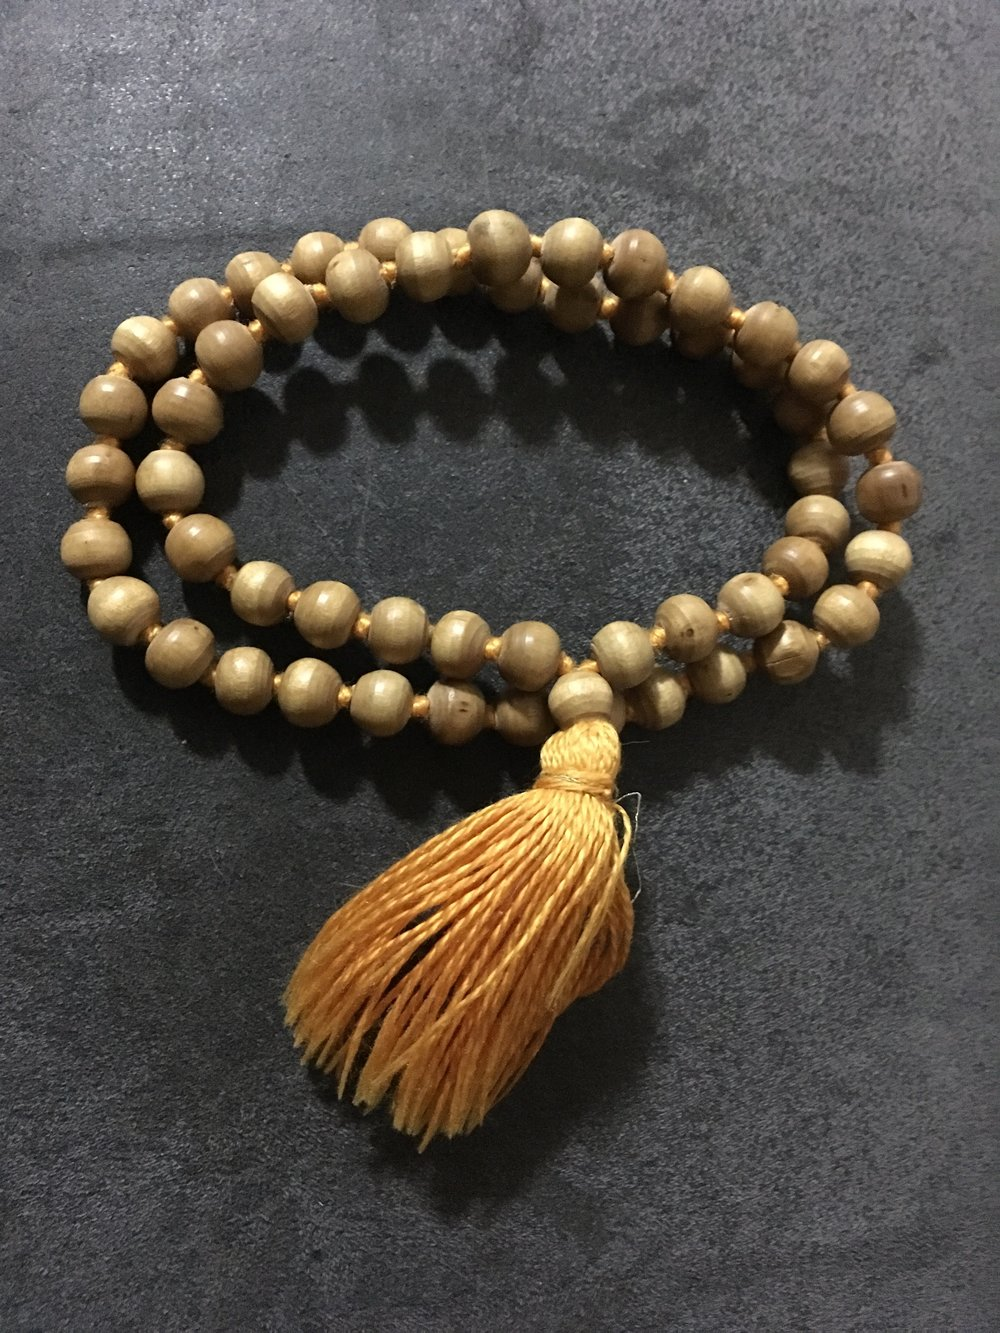 mala beads half set.JPG